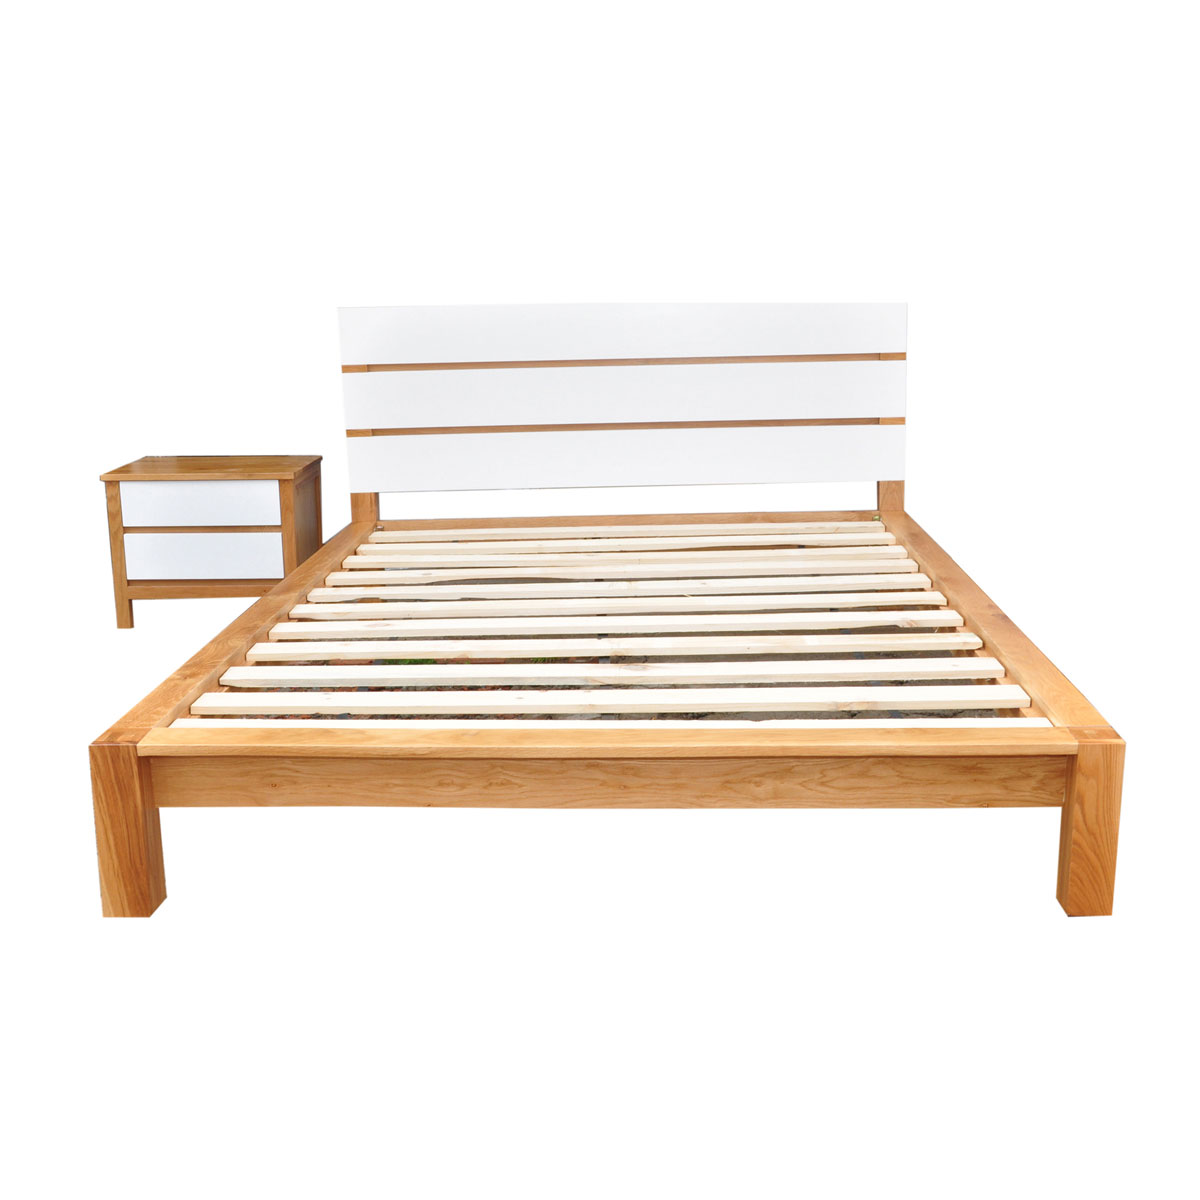 Giường đôi Ocean gỗ sồi 2m trắng - IBIE